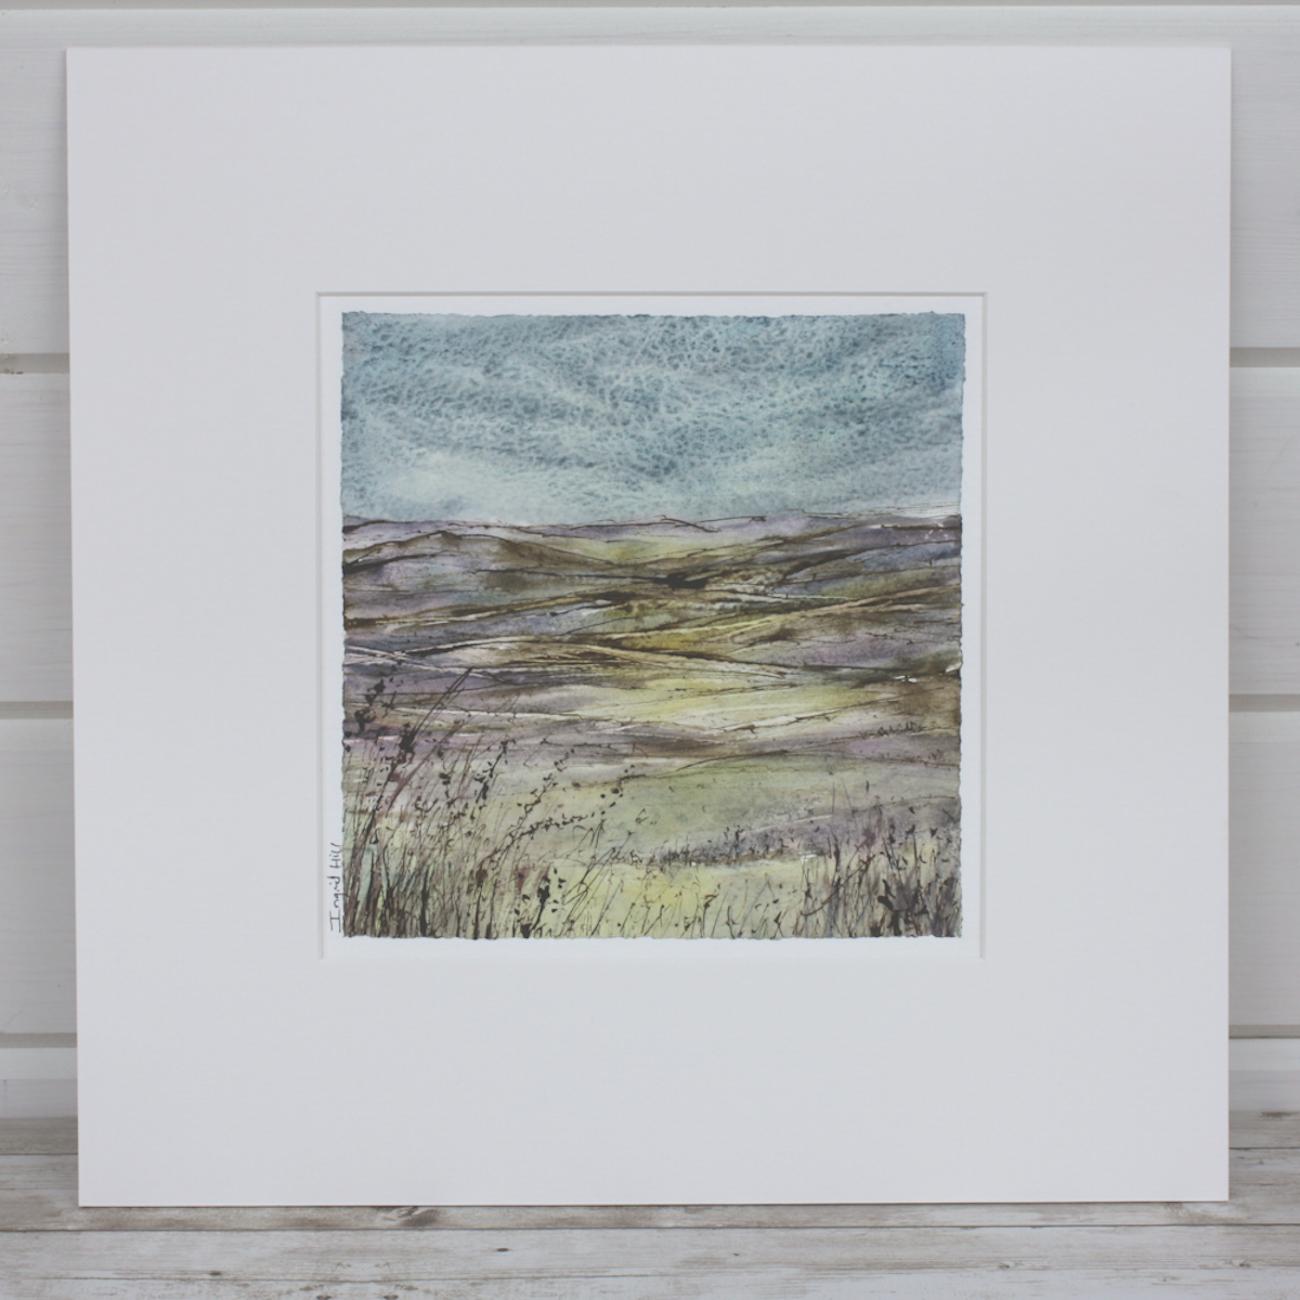 Enjoying the Moment, Mini Landscape Series